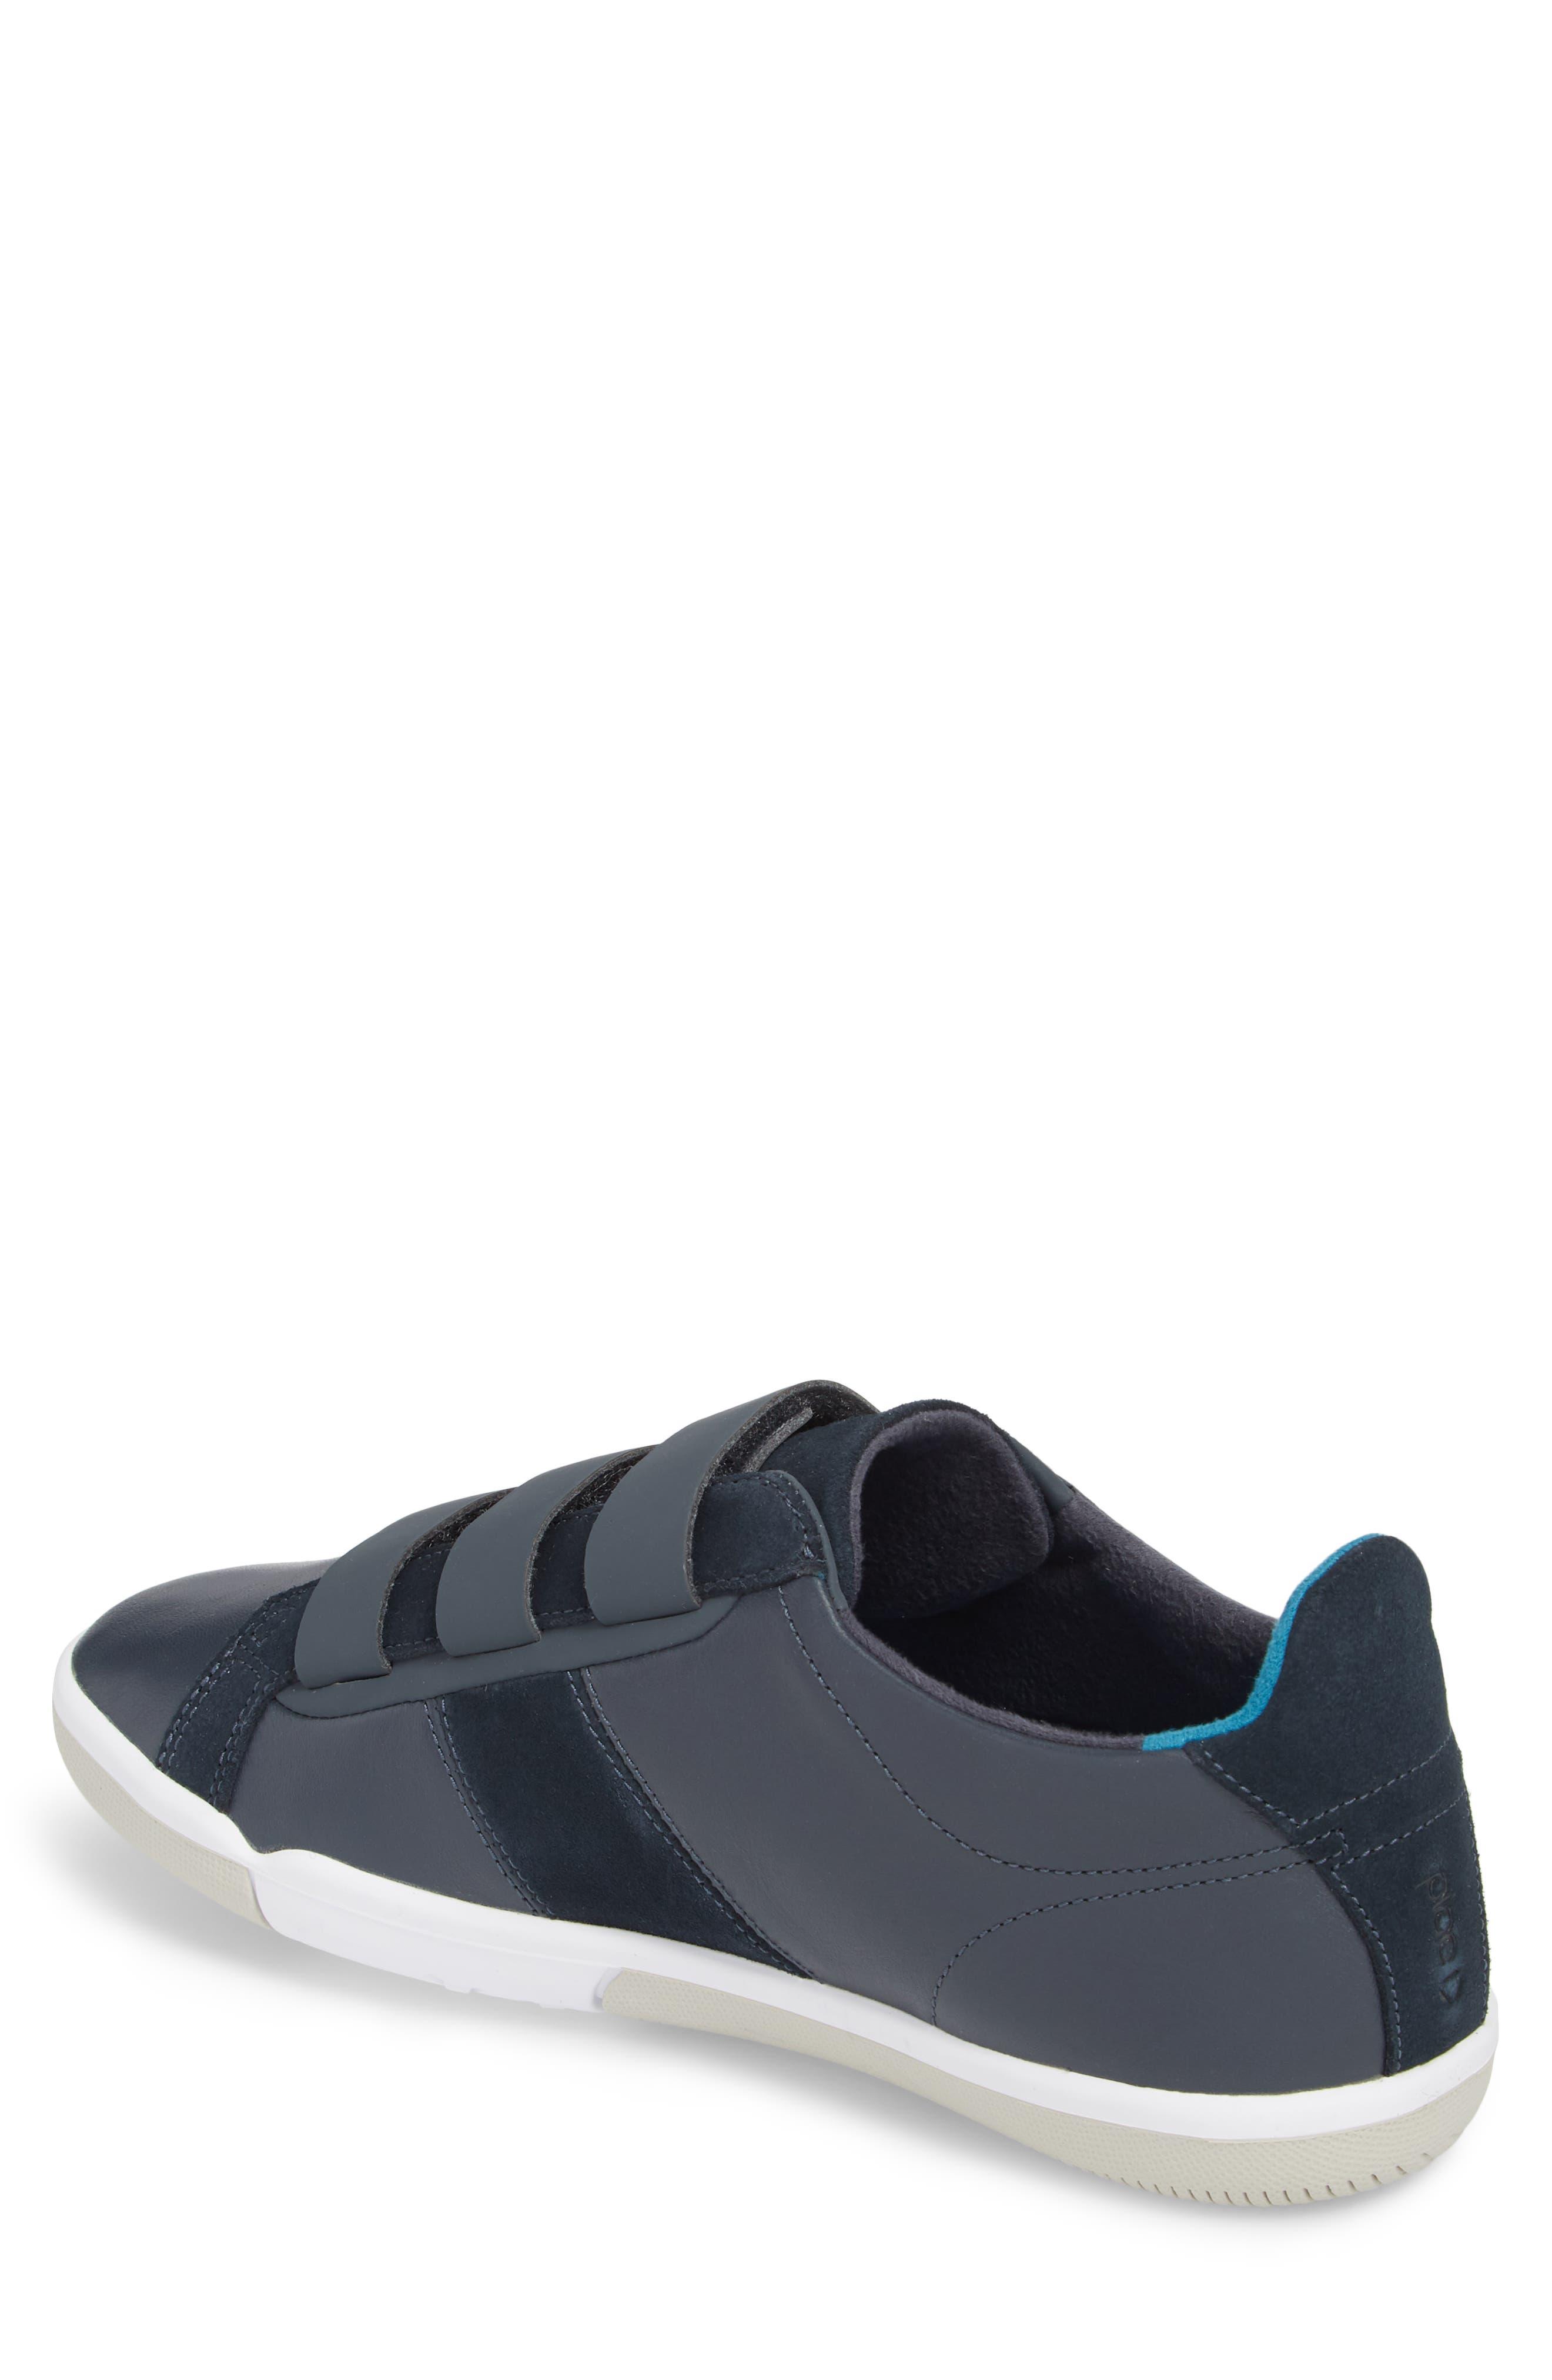 Larkin Low Top Sneaker,                             Alternate thumbnail 2, color,                             Blue Nights